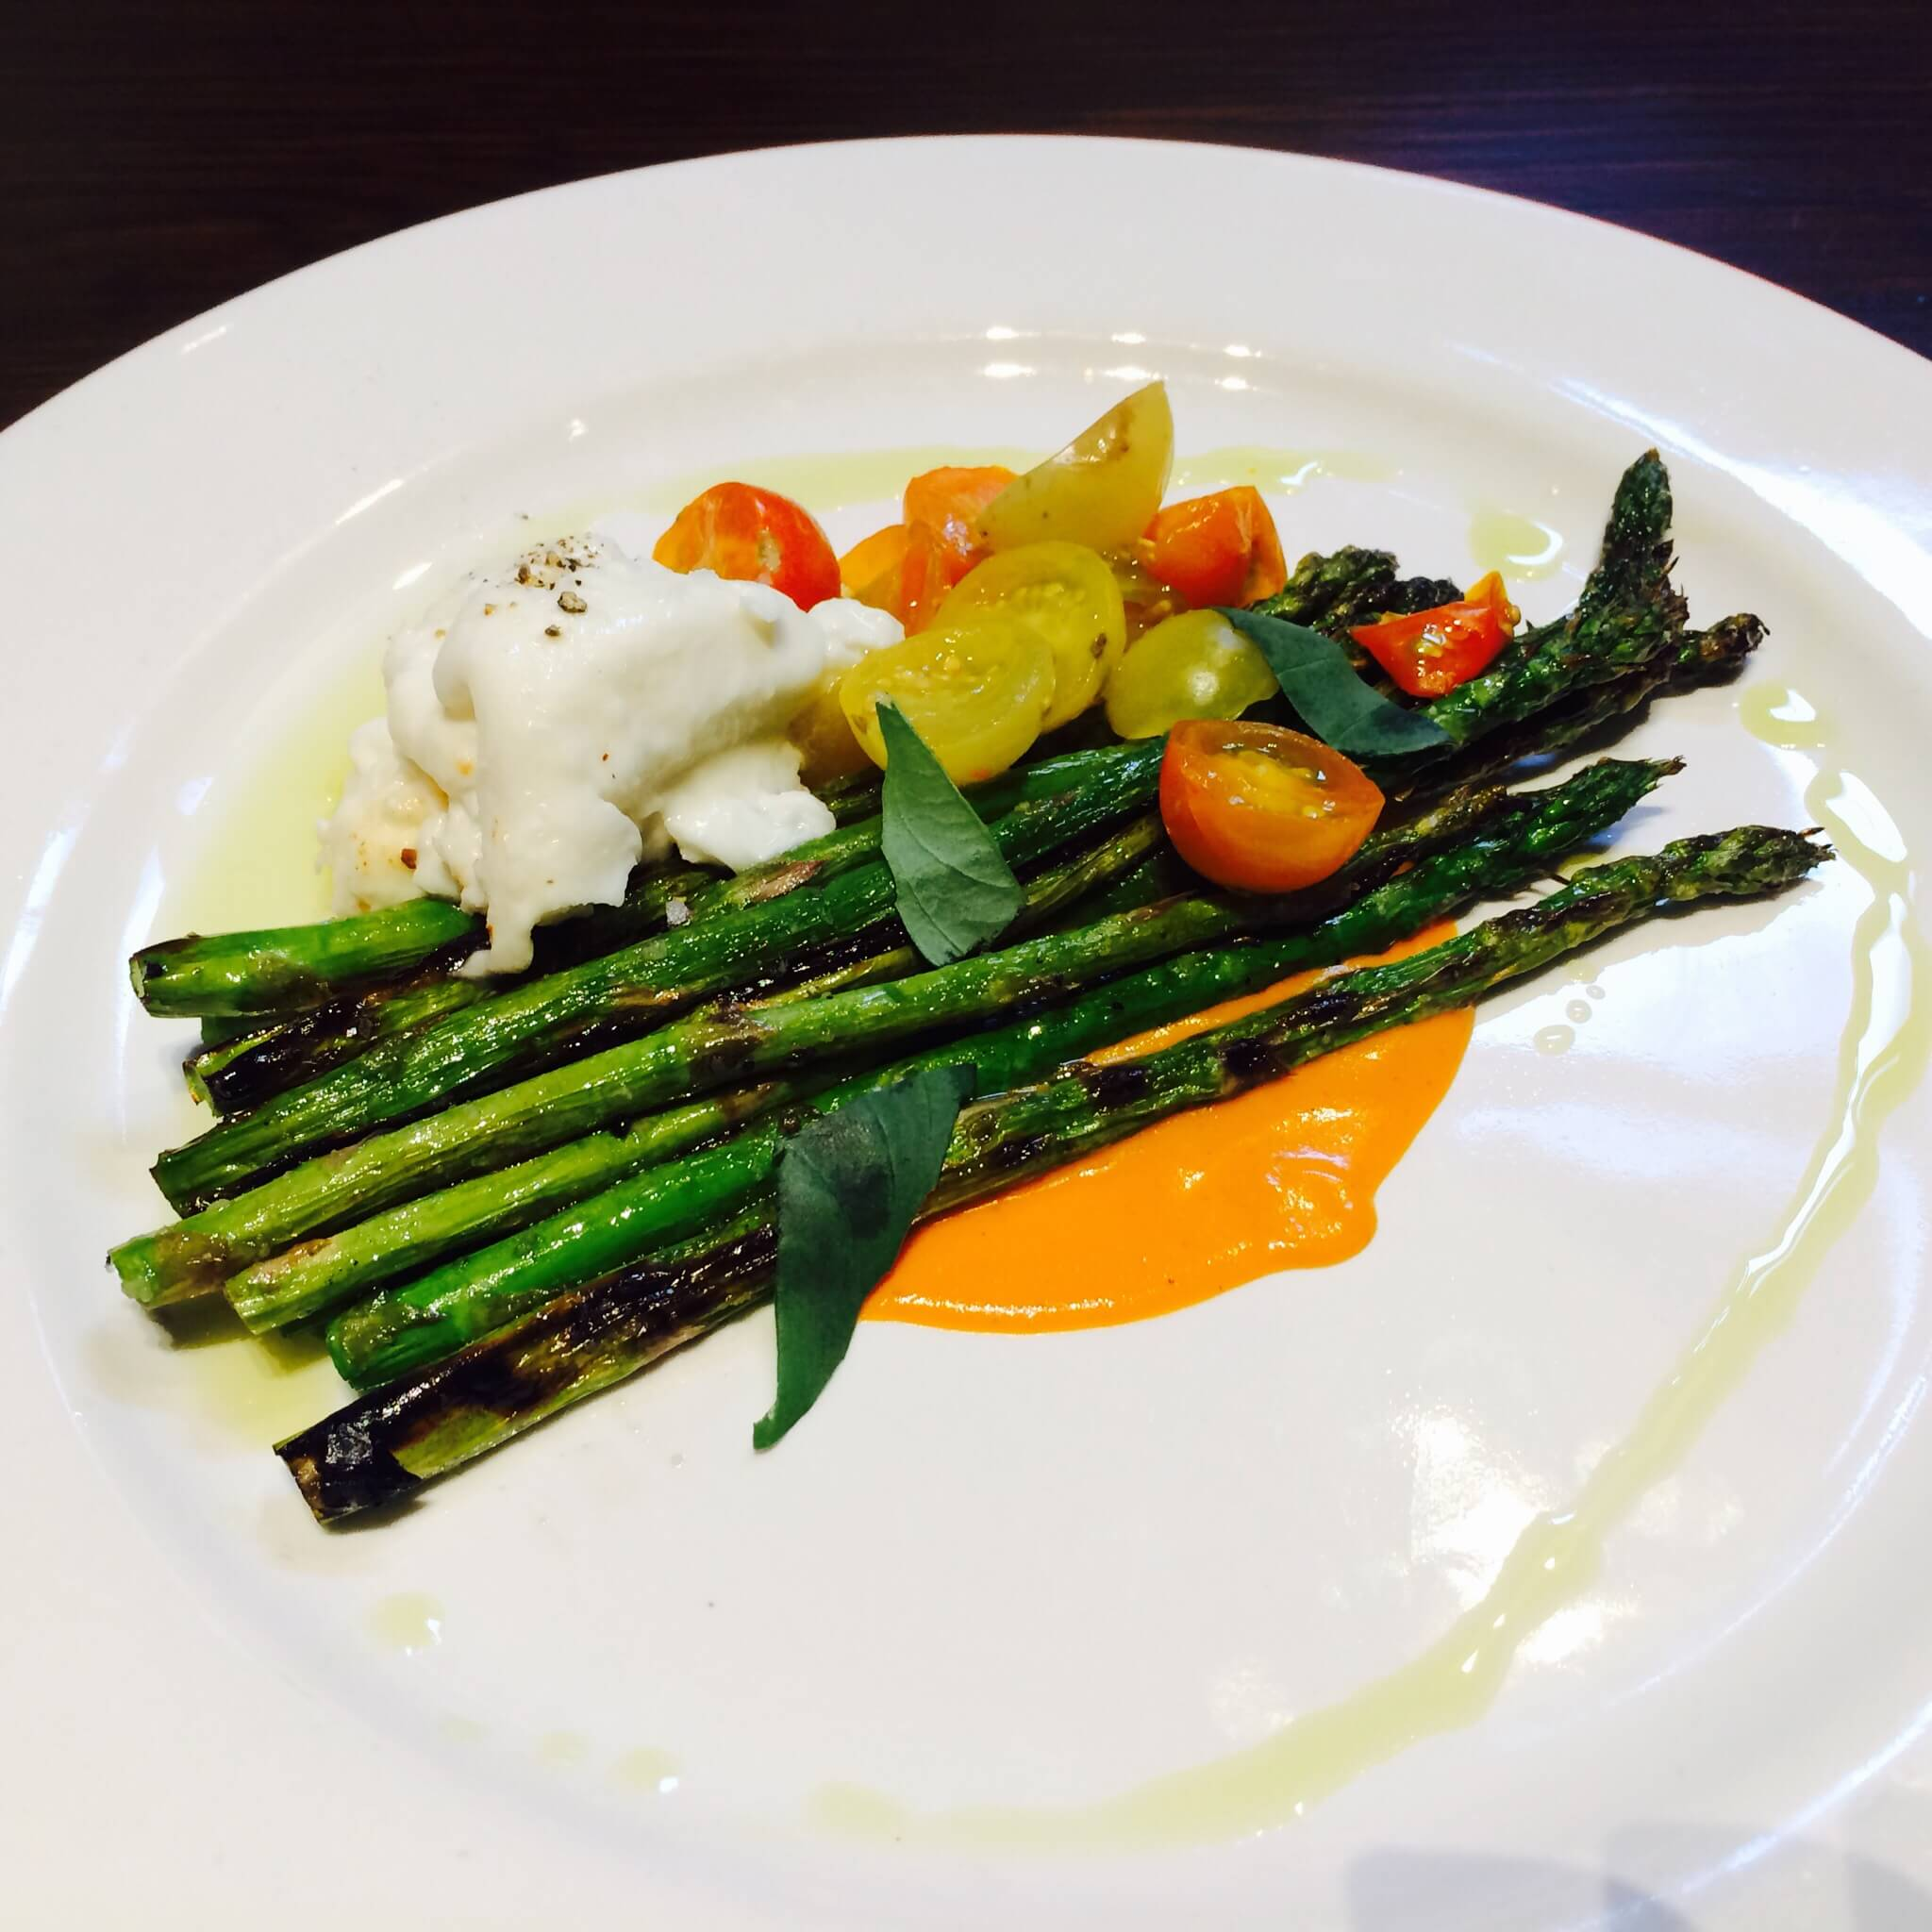 GRILLED ASPARAGUS-Burrata, tomato vinaigrette, opal basil & olive oil